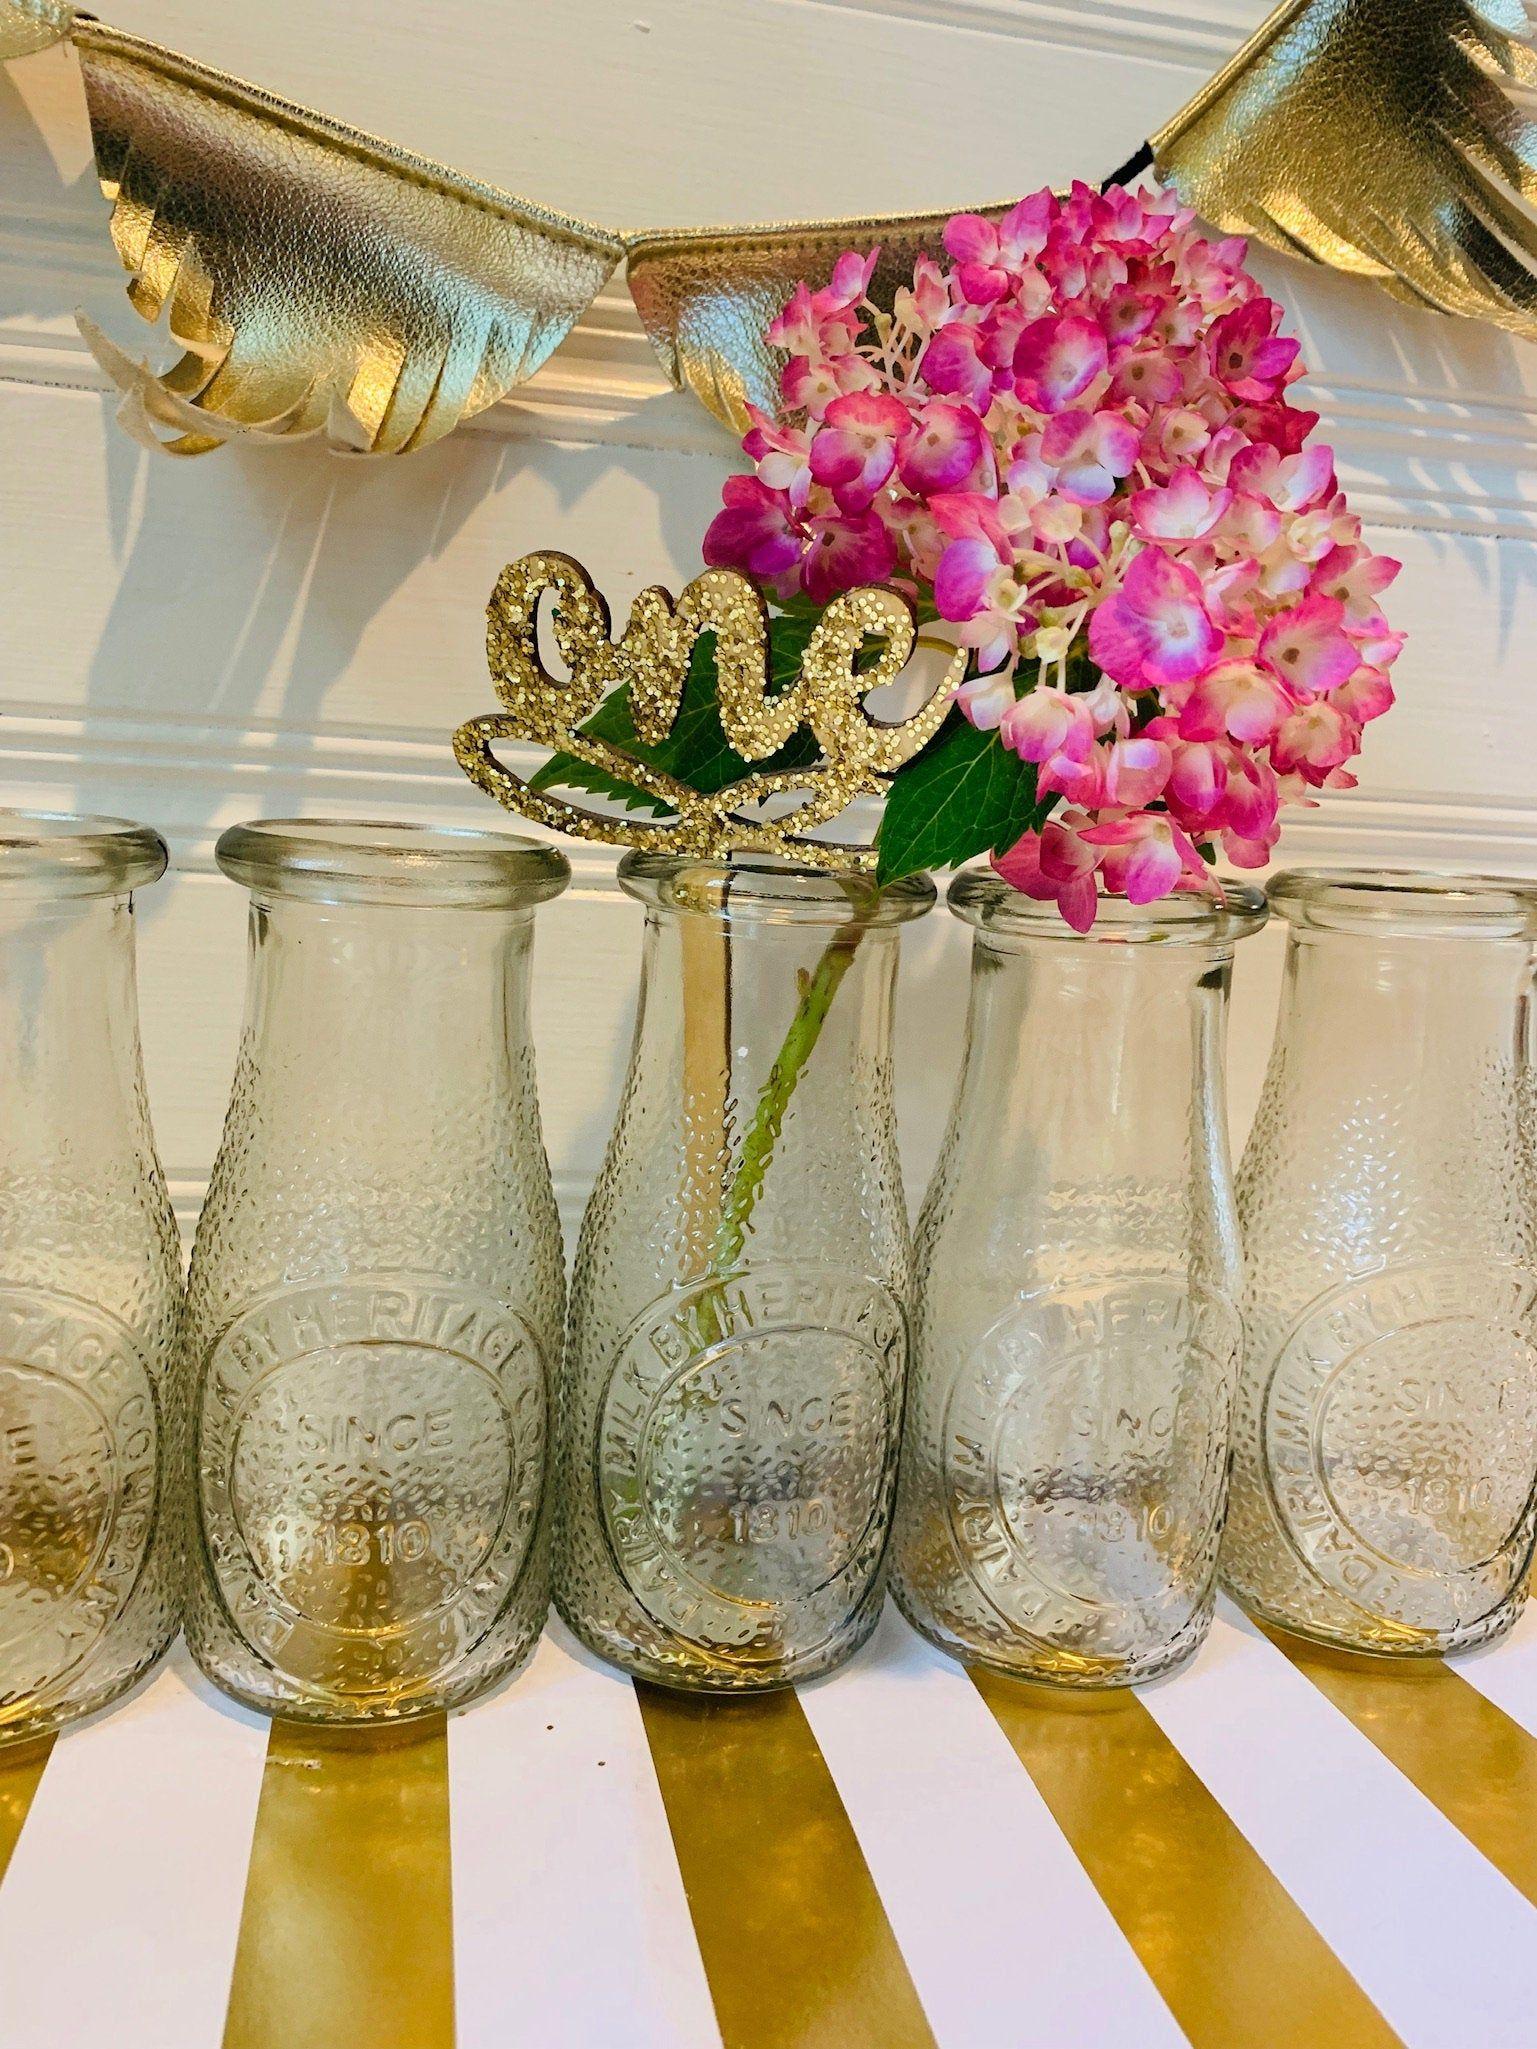 Retro Vintage Small Milk Bottle Bud Vases Bulk Wedding Centerpieces Cheap Glass Vases Small Milk Bottles Glass Vases Centerpieces